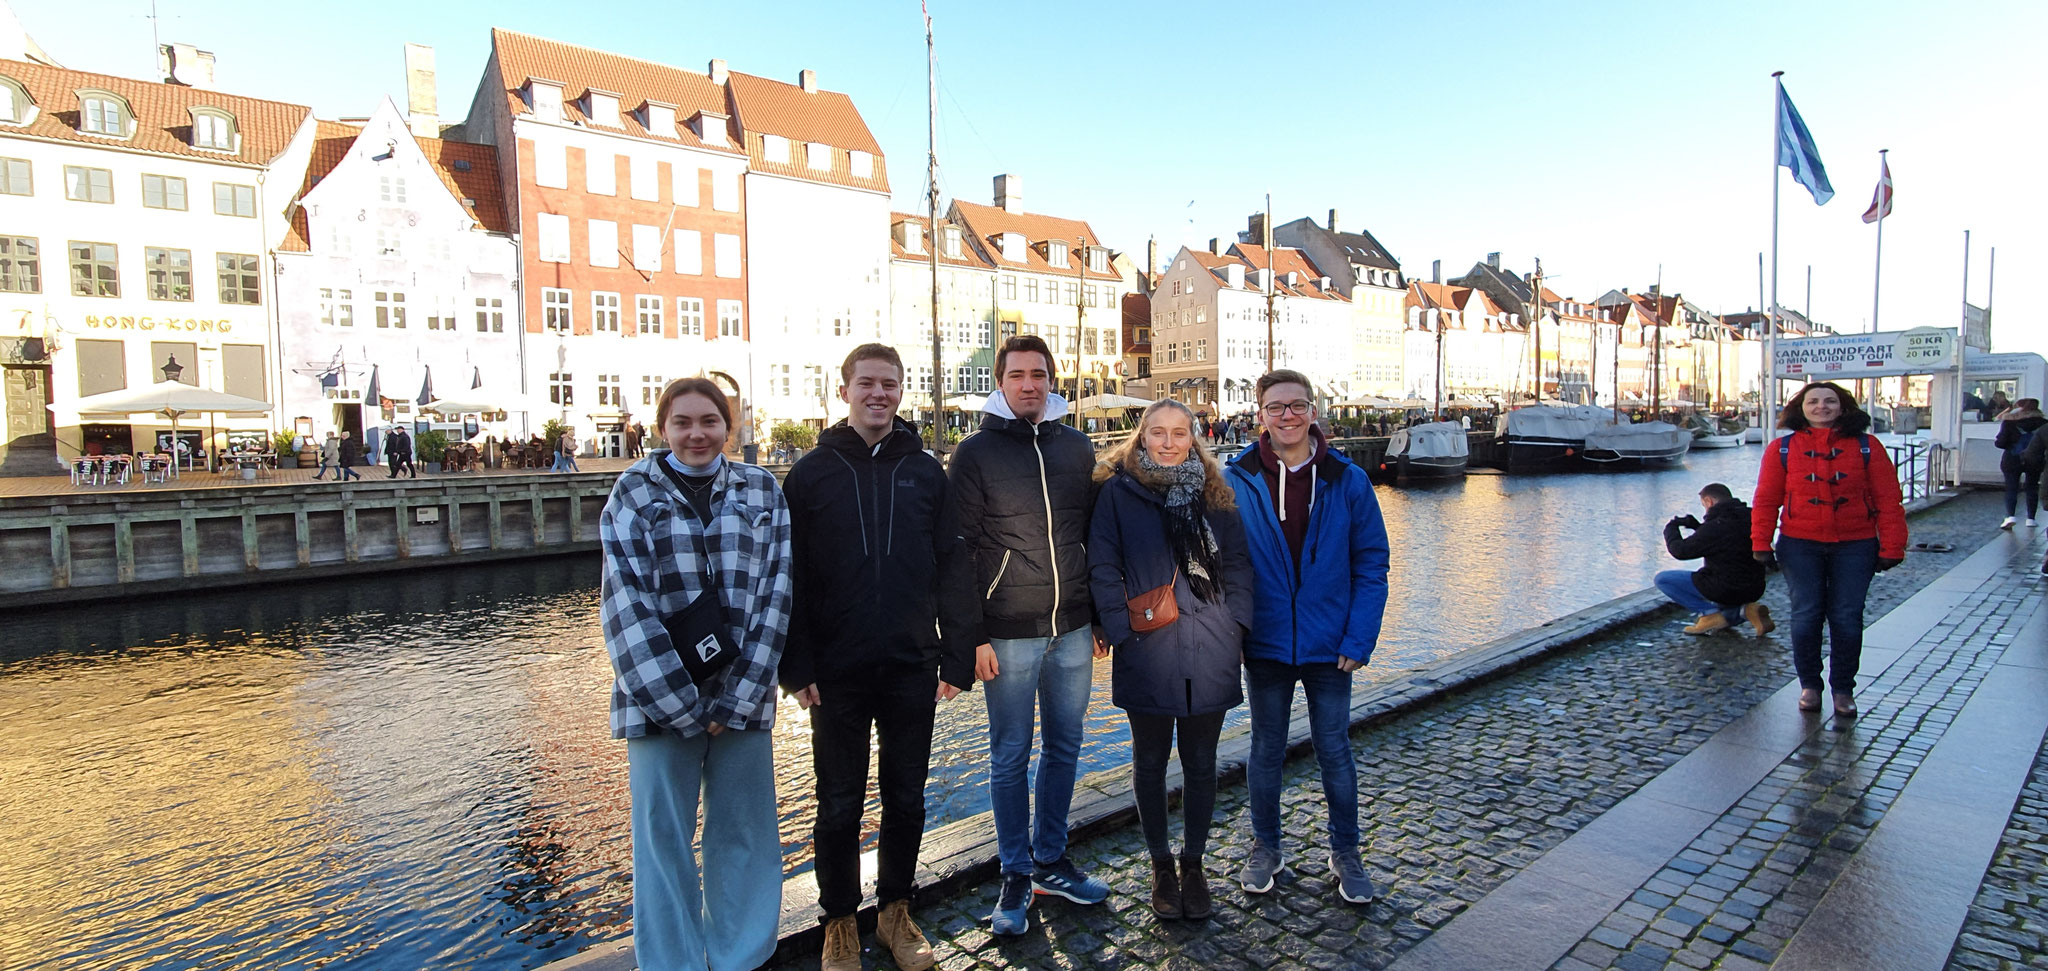 (v.l.) Greta, Lasse, Philipp, Franzi, Thomas - Zu Besuch in Kopenhagen